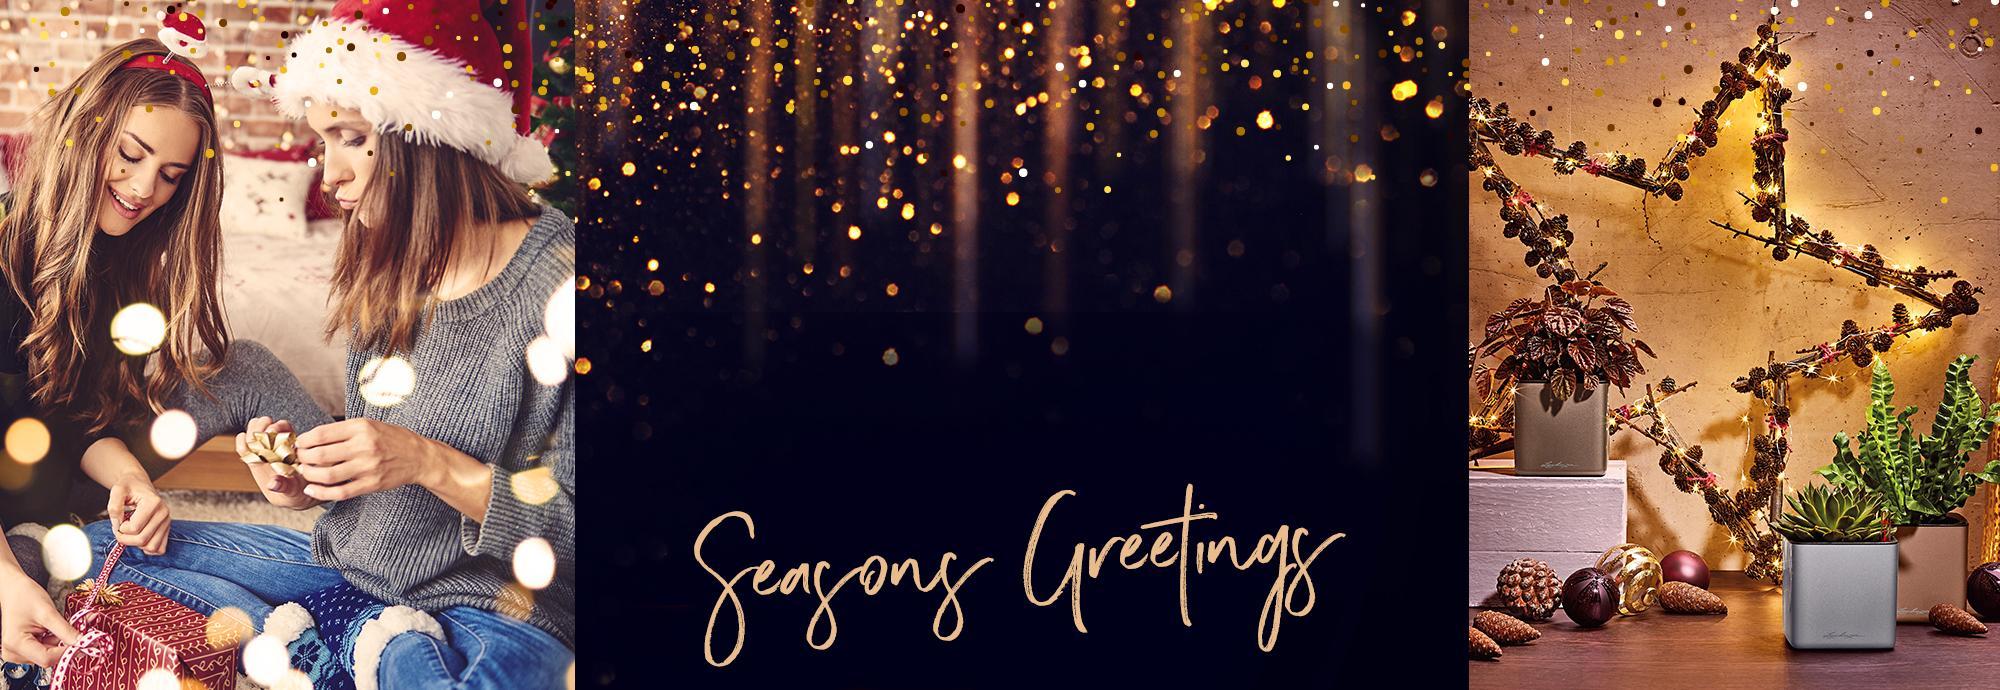 le_hero_banner_tw_seasons-greetings_de